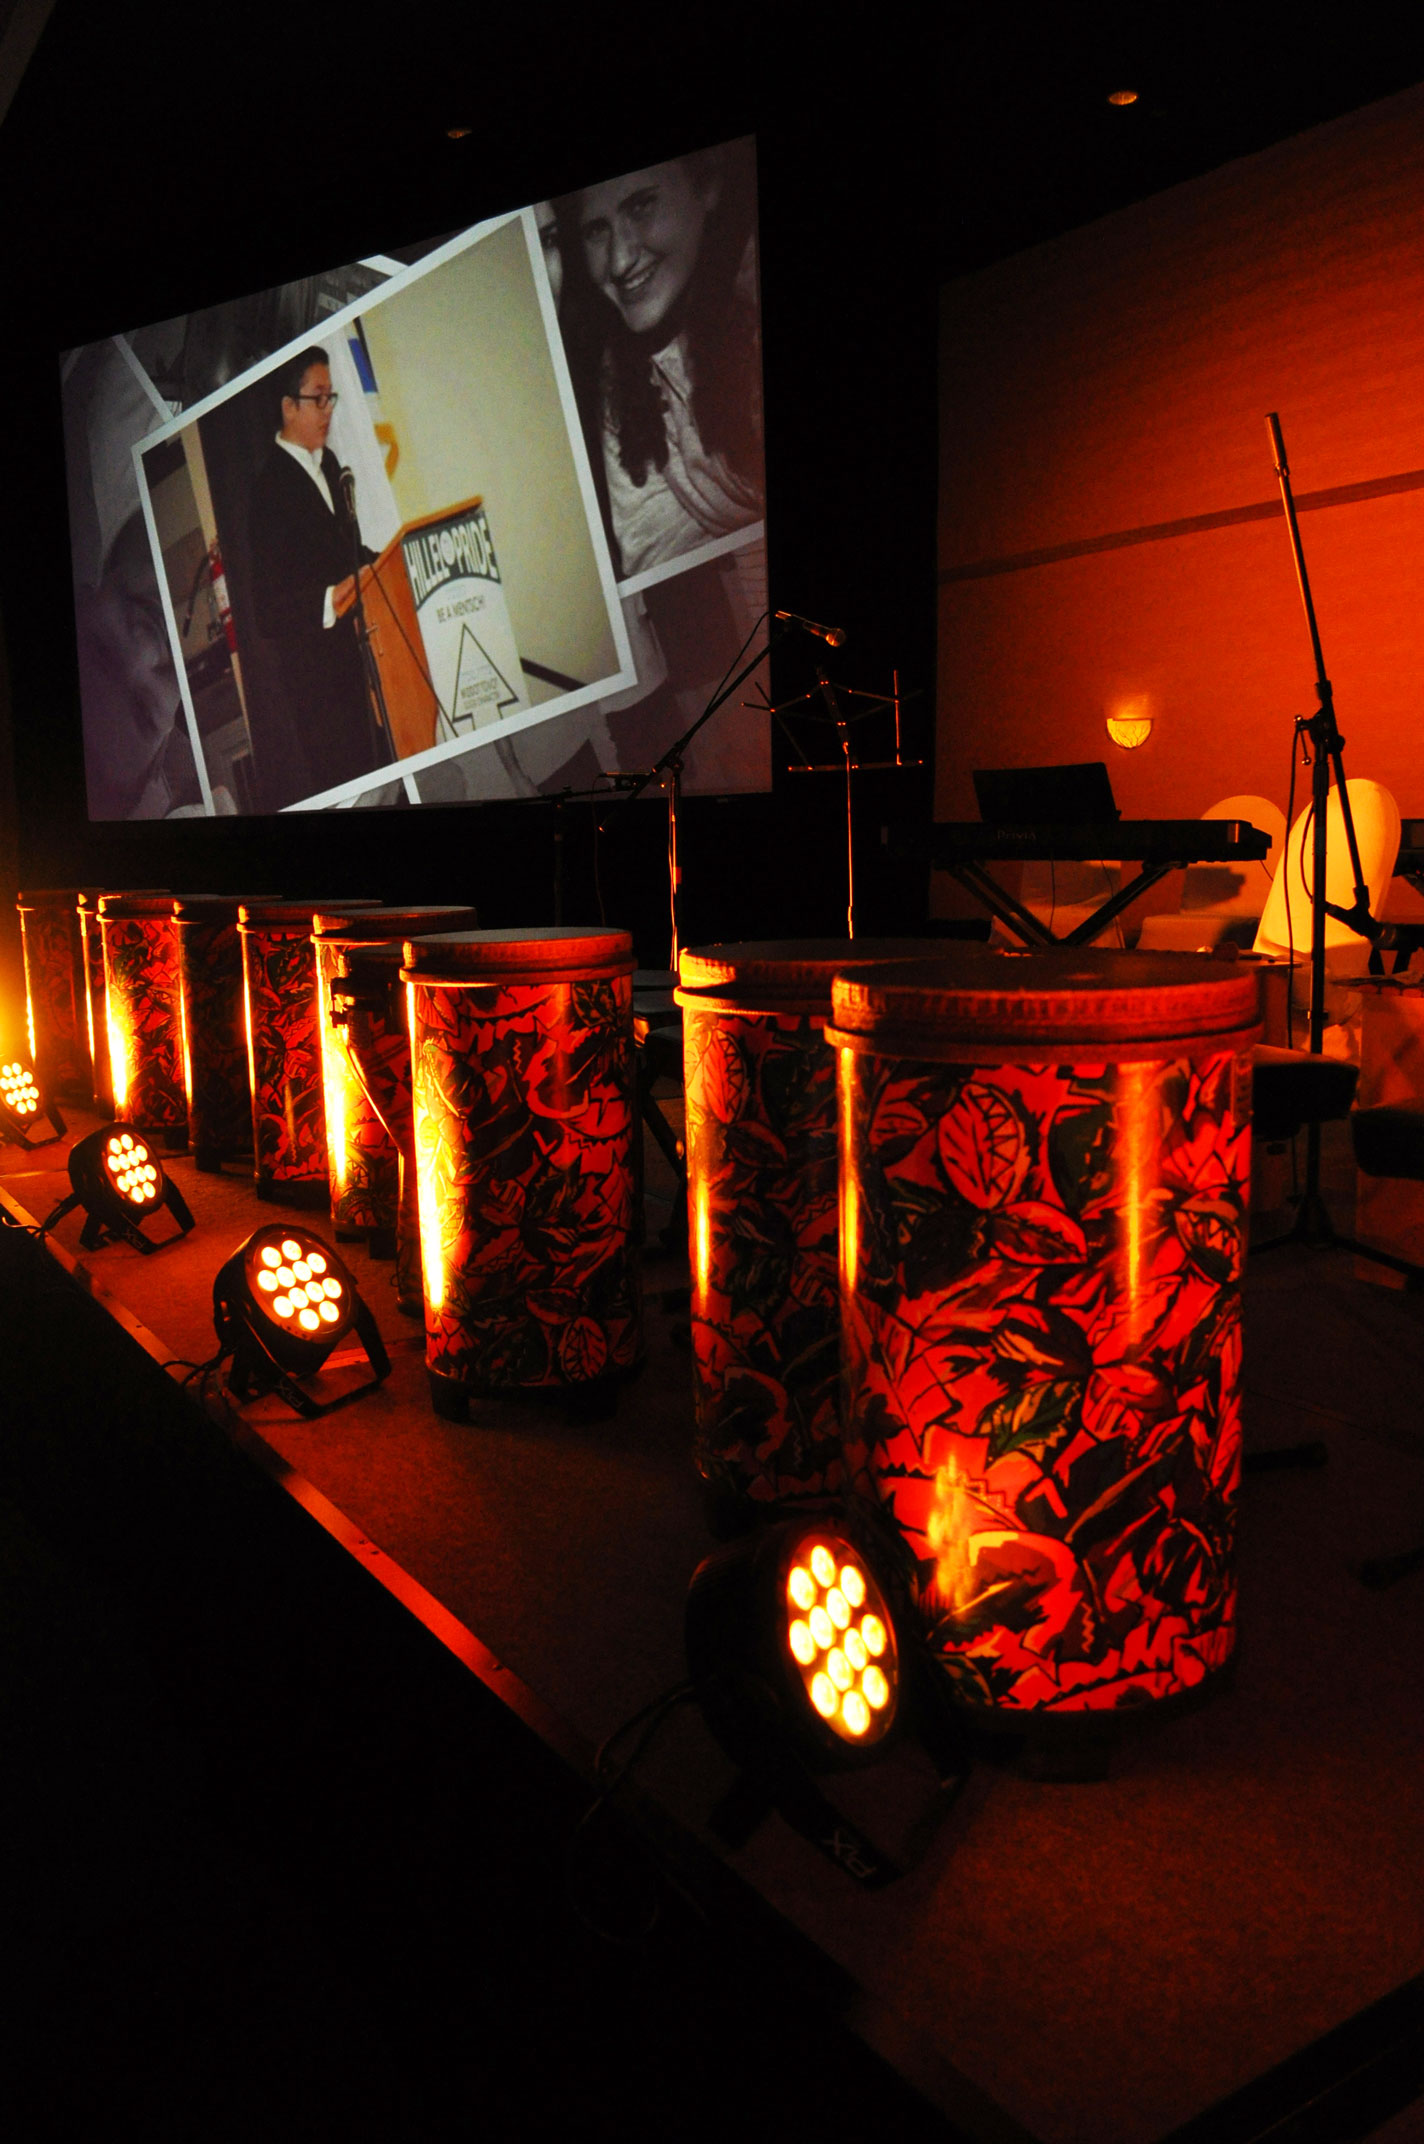 concerts-live-music-padano-productions13.jpg